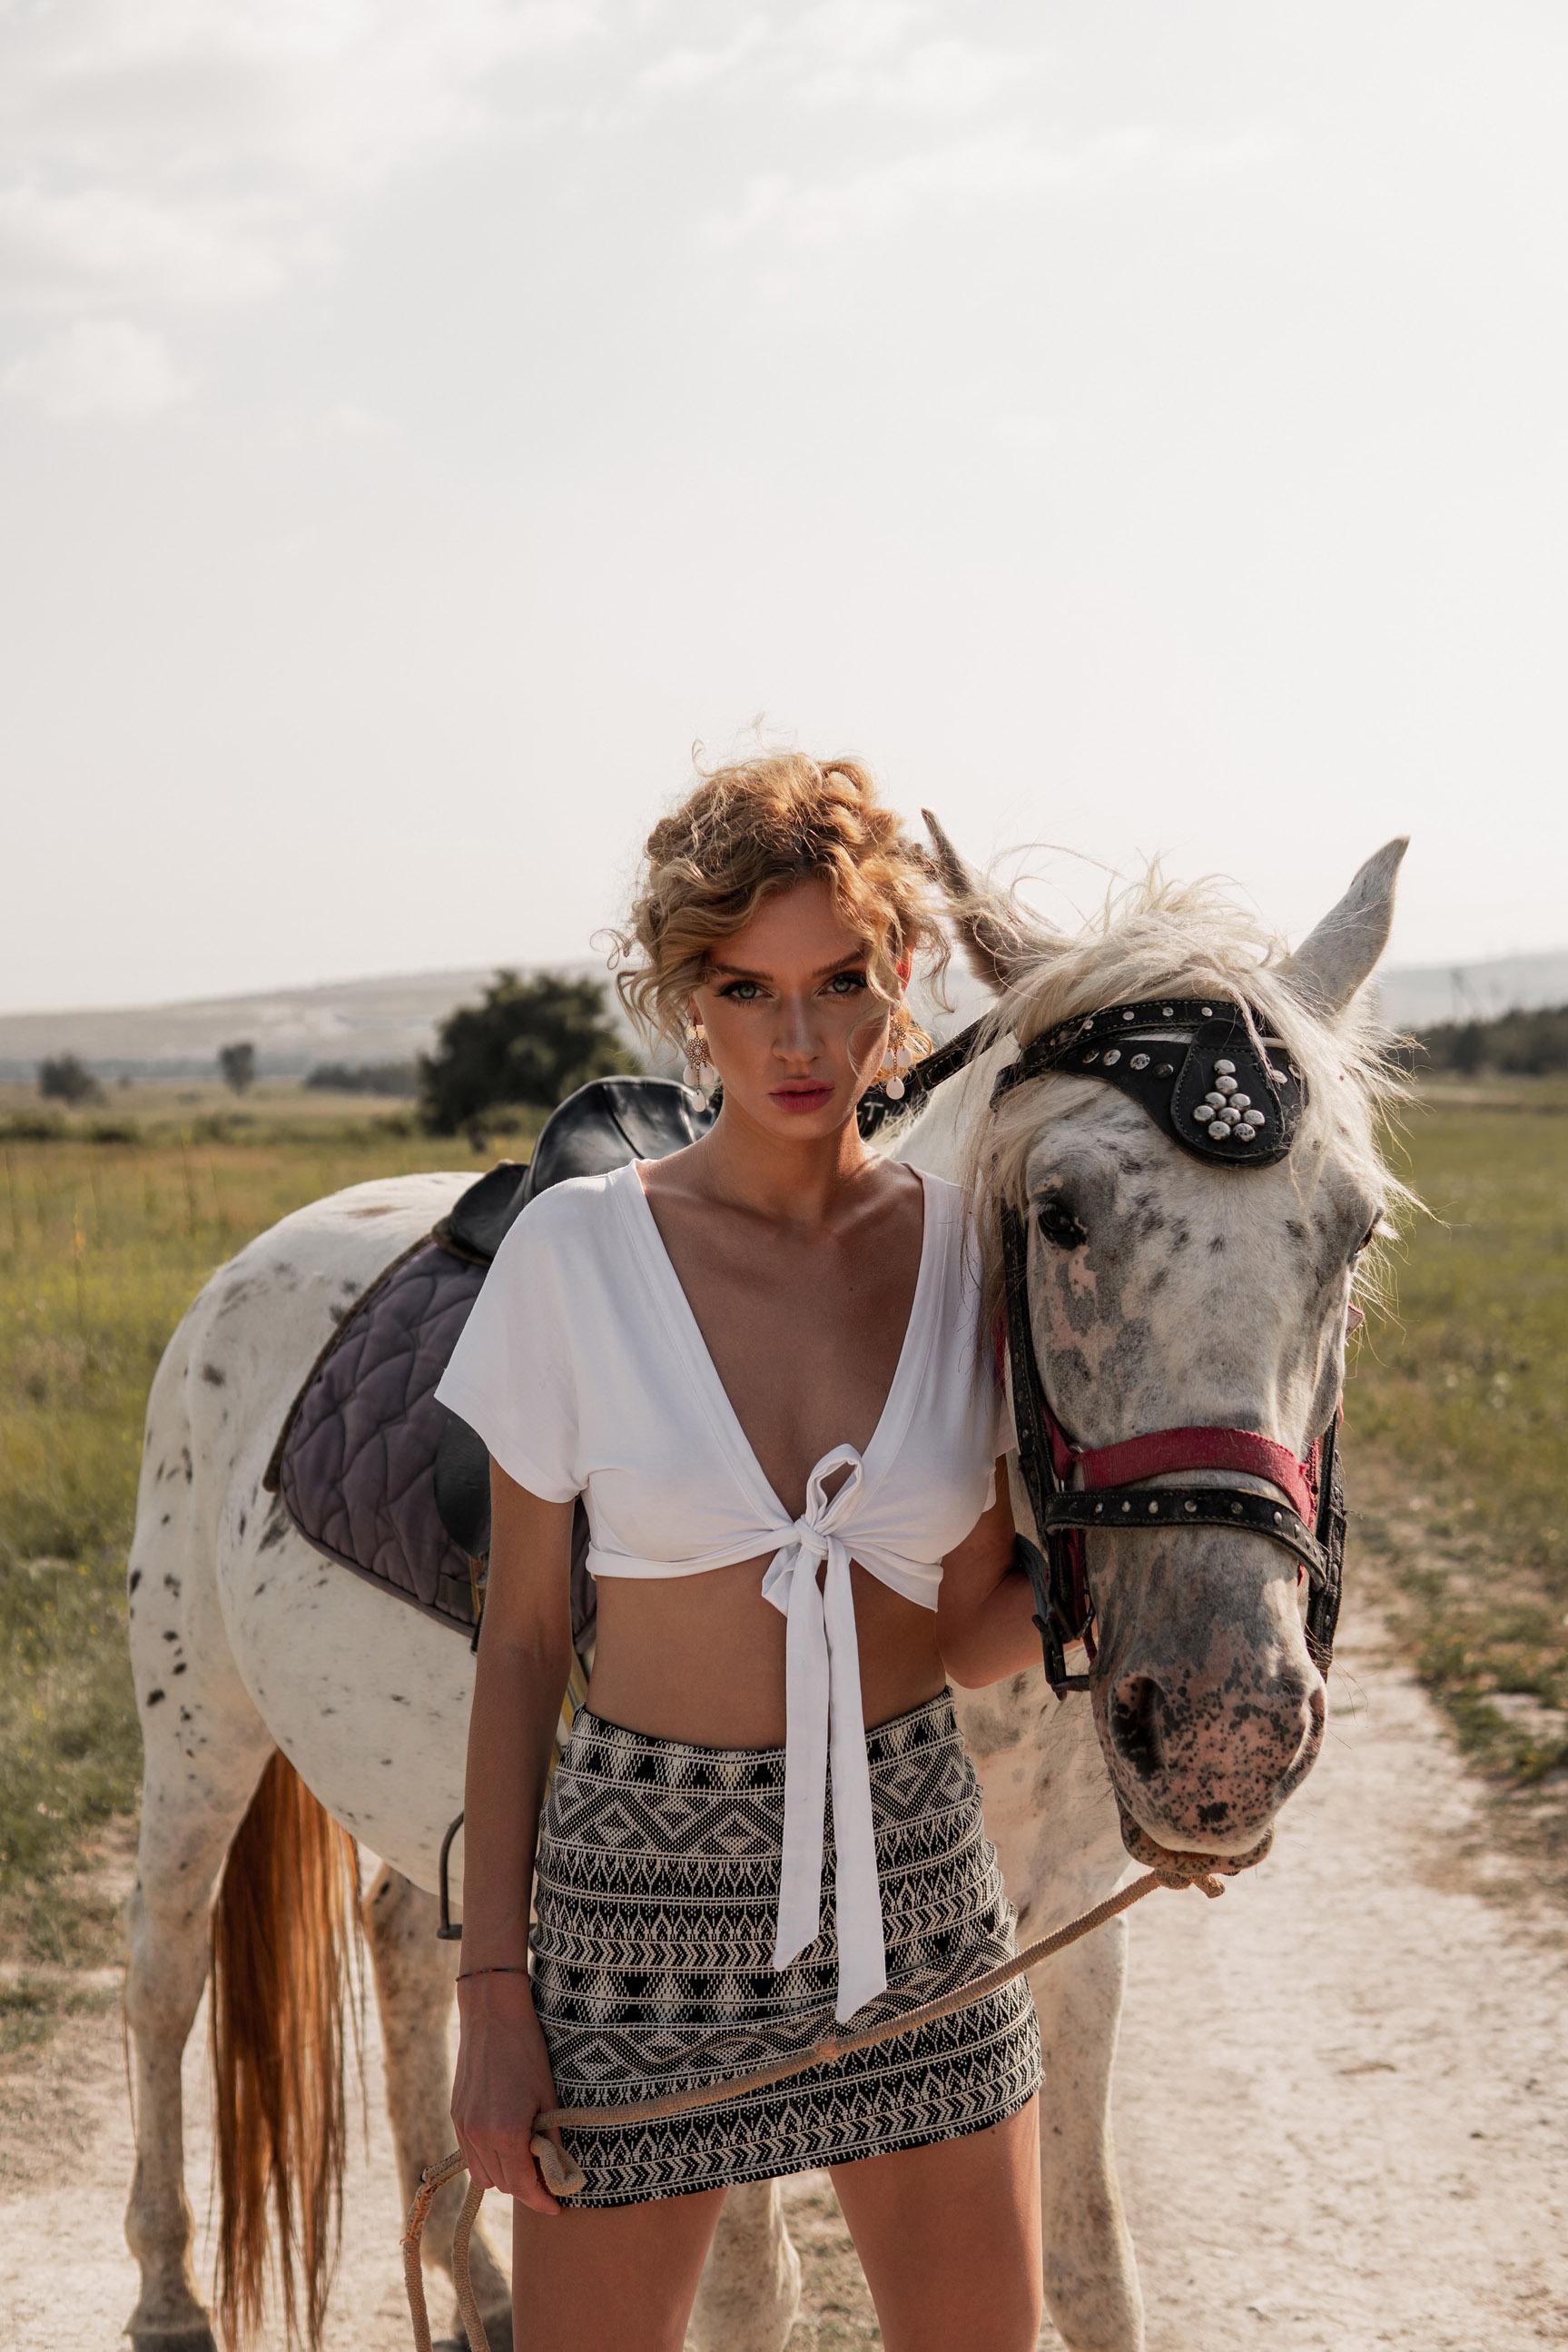 Девушка и лошадь / Даша Степанова в журнале Picton / фото 03